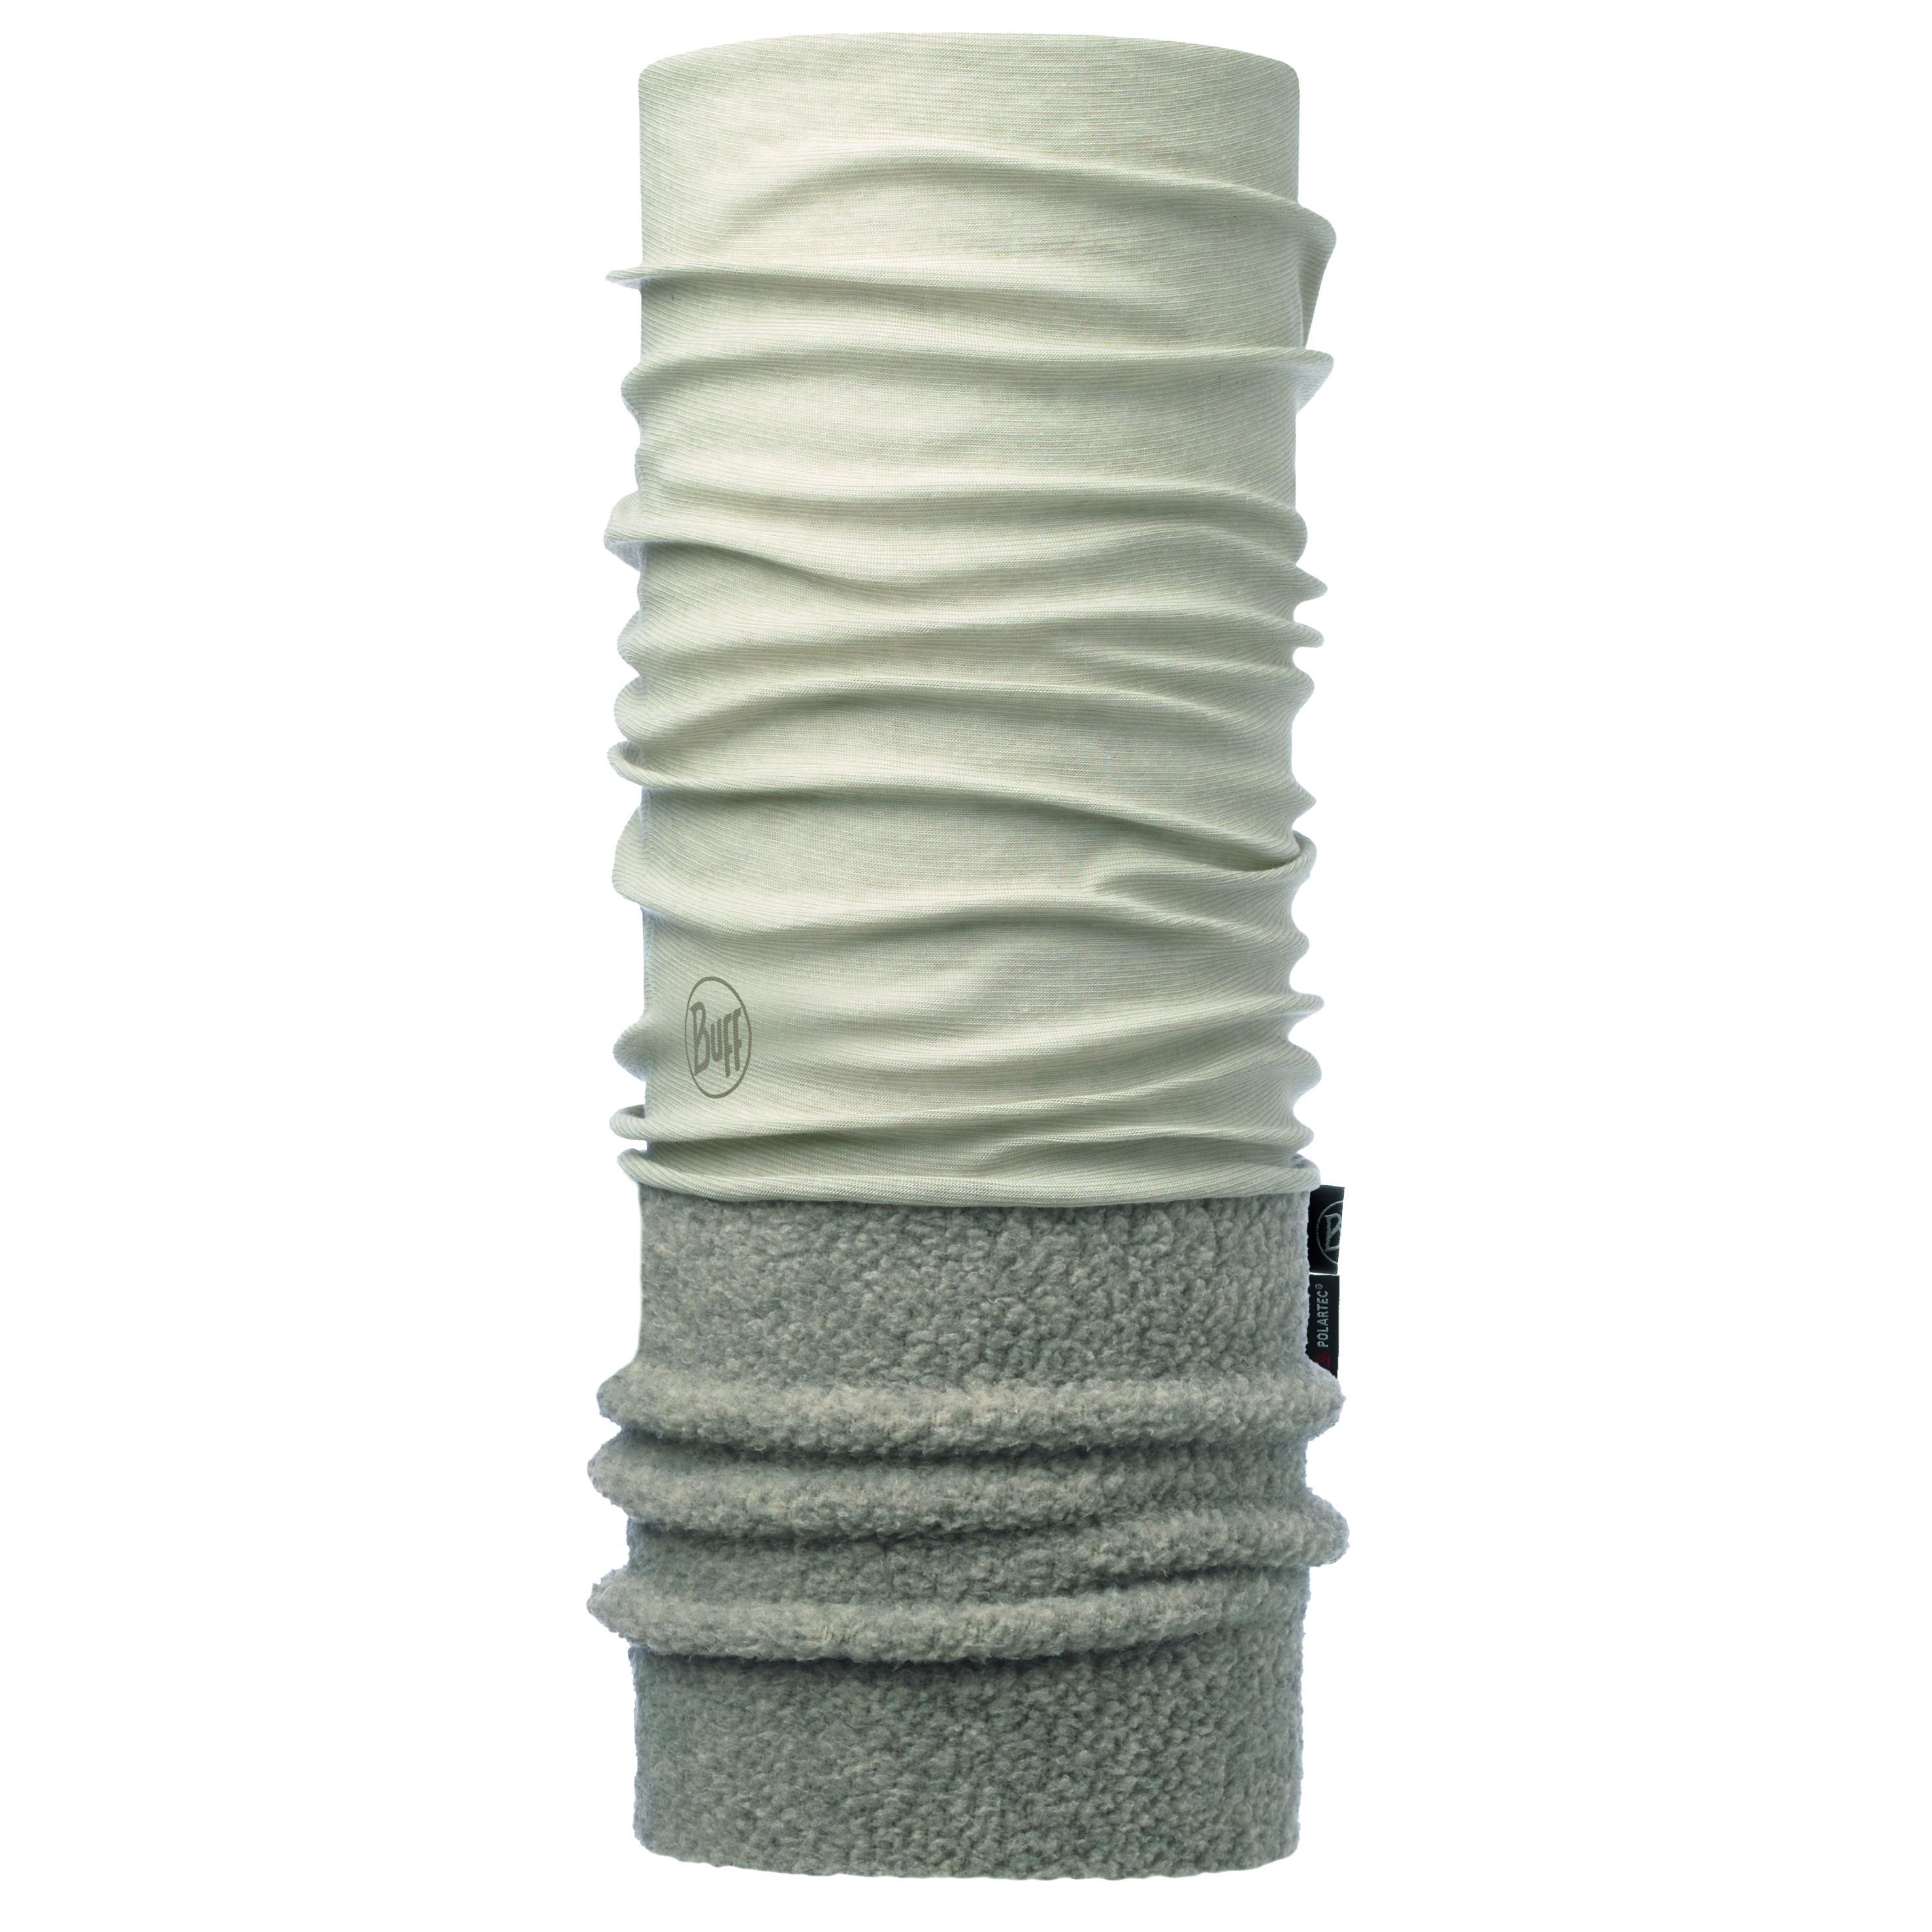 Купить Бандана BUFF POLAR THERMAL STRIPES CRU, Банданы и шарфы Buff ®, 1307985